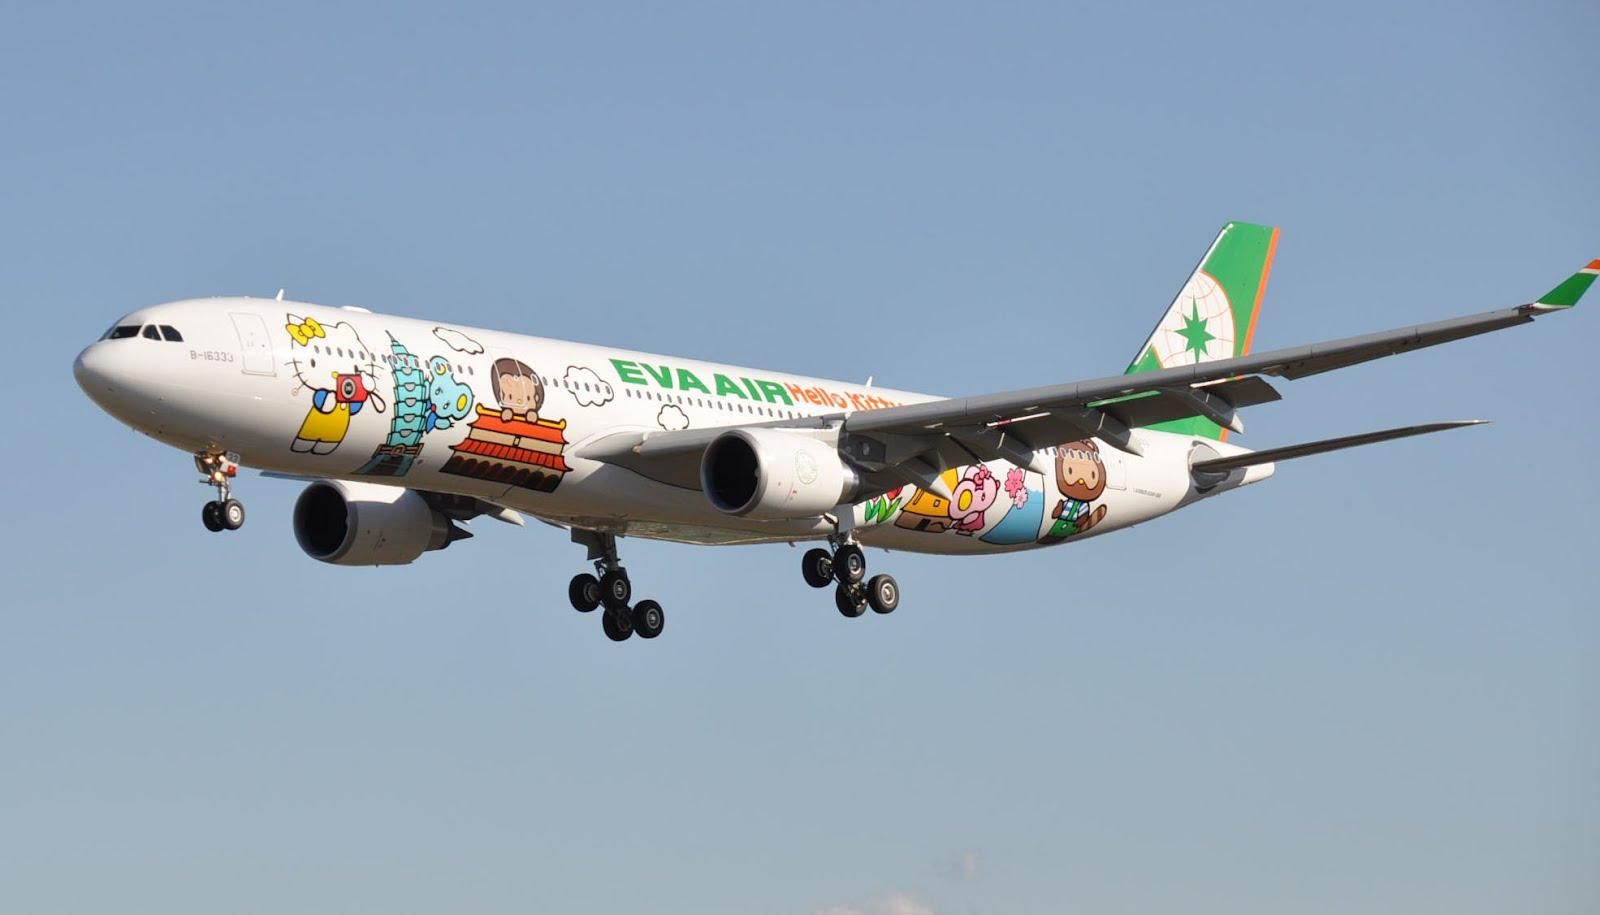 http://2.bp.blogspot.com/-blB5Eywry1I/TzmxEBRmOHI/AAAAAAACDpQ/HKDTfSFudvQ/s1600/EVA-Hello-Kitty-Global-Jet-in-the-Air.jpg